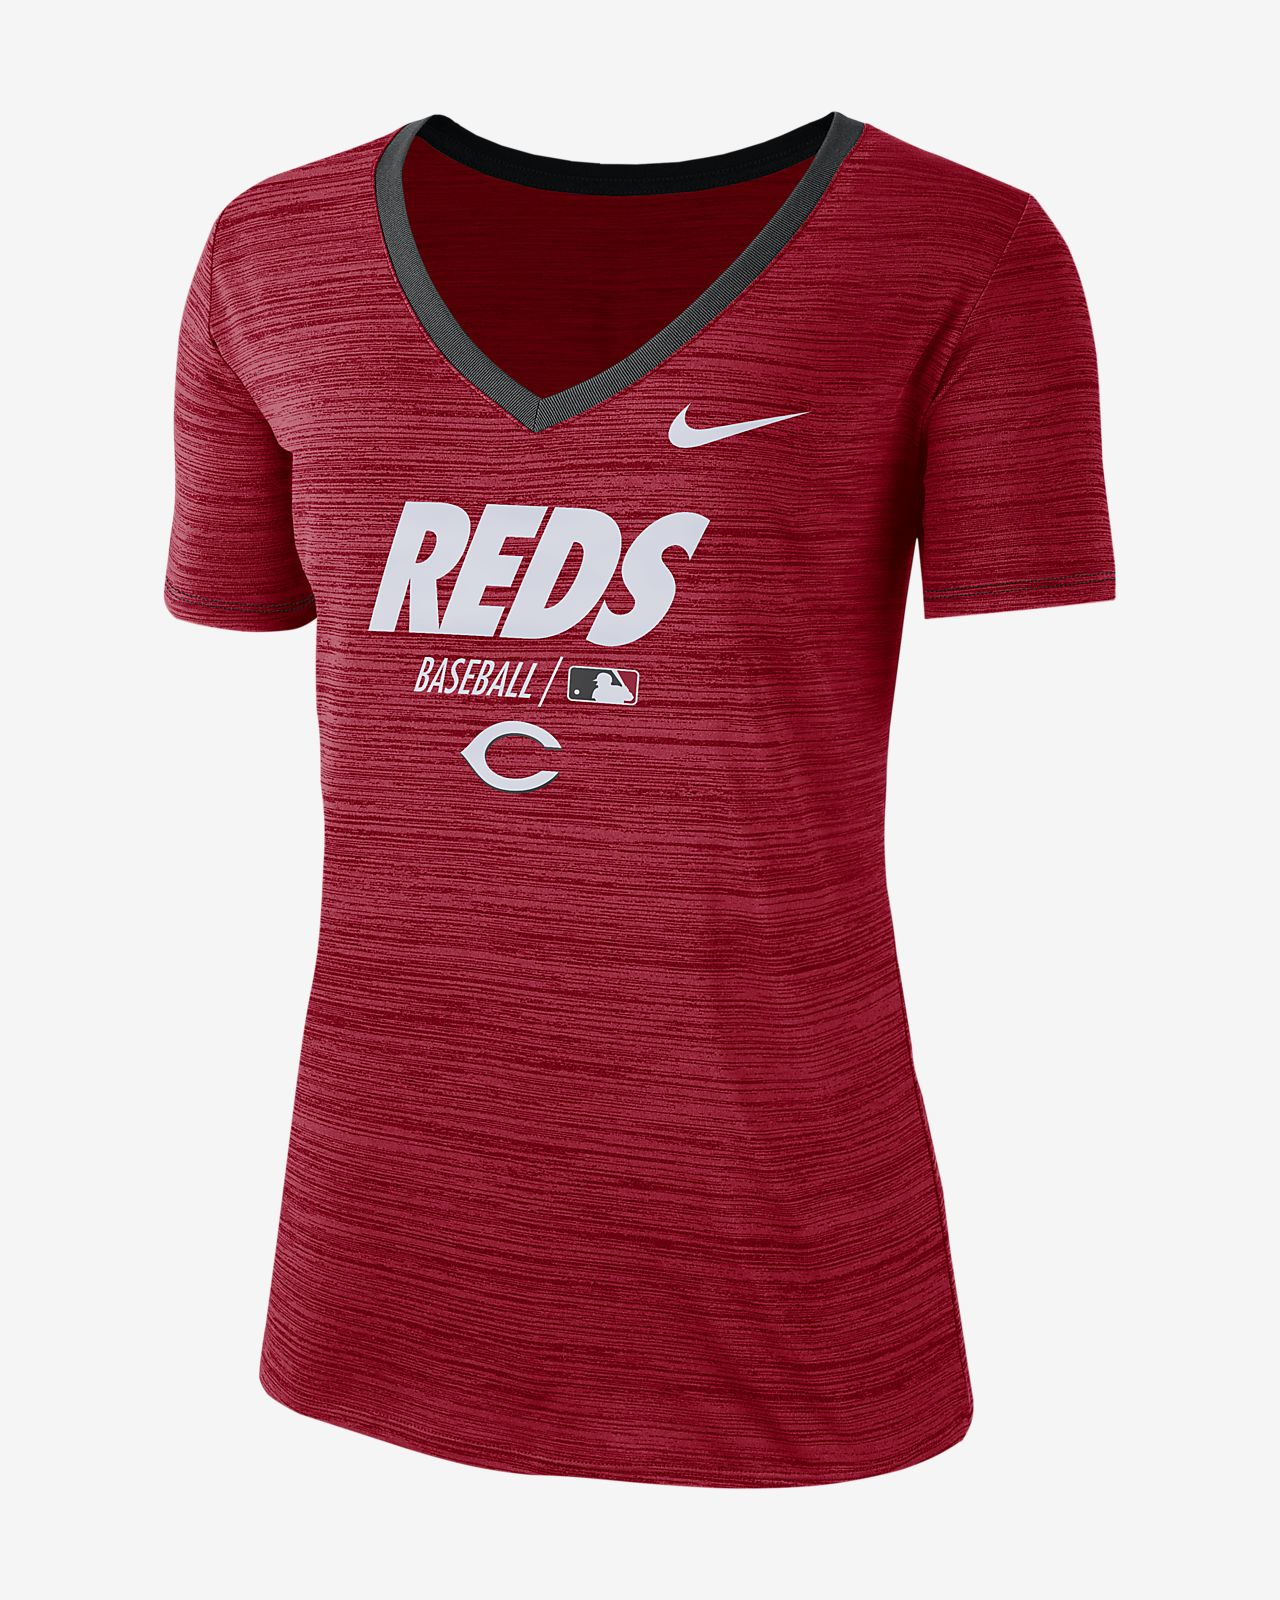 Nike Dri-FIT AC Velocity Team Issue (MLB Reds) Women's T-Shirt